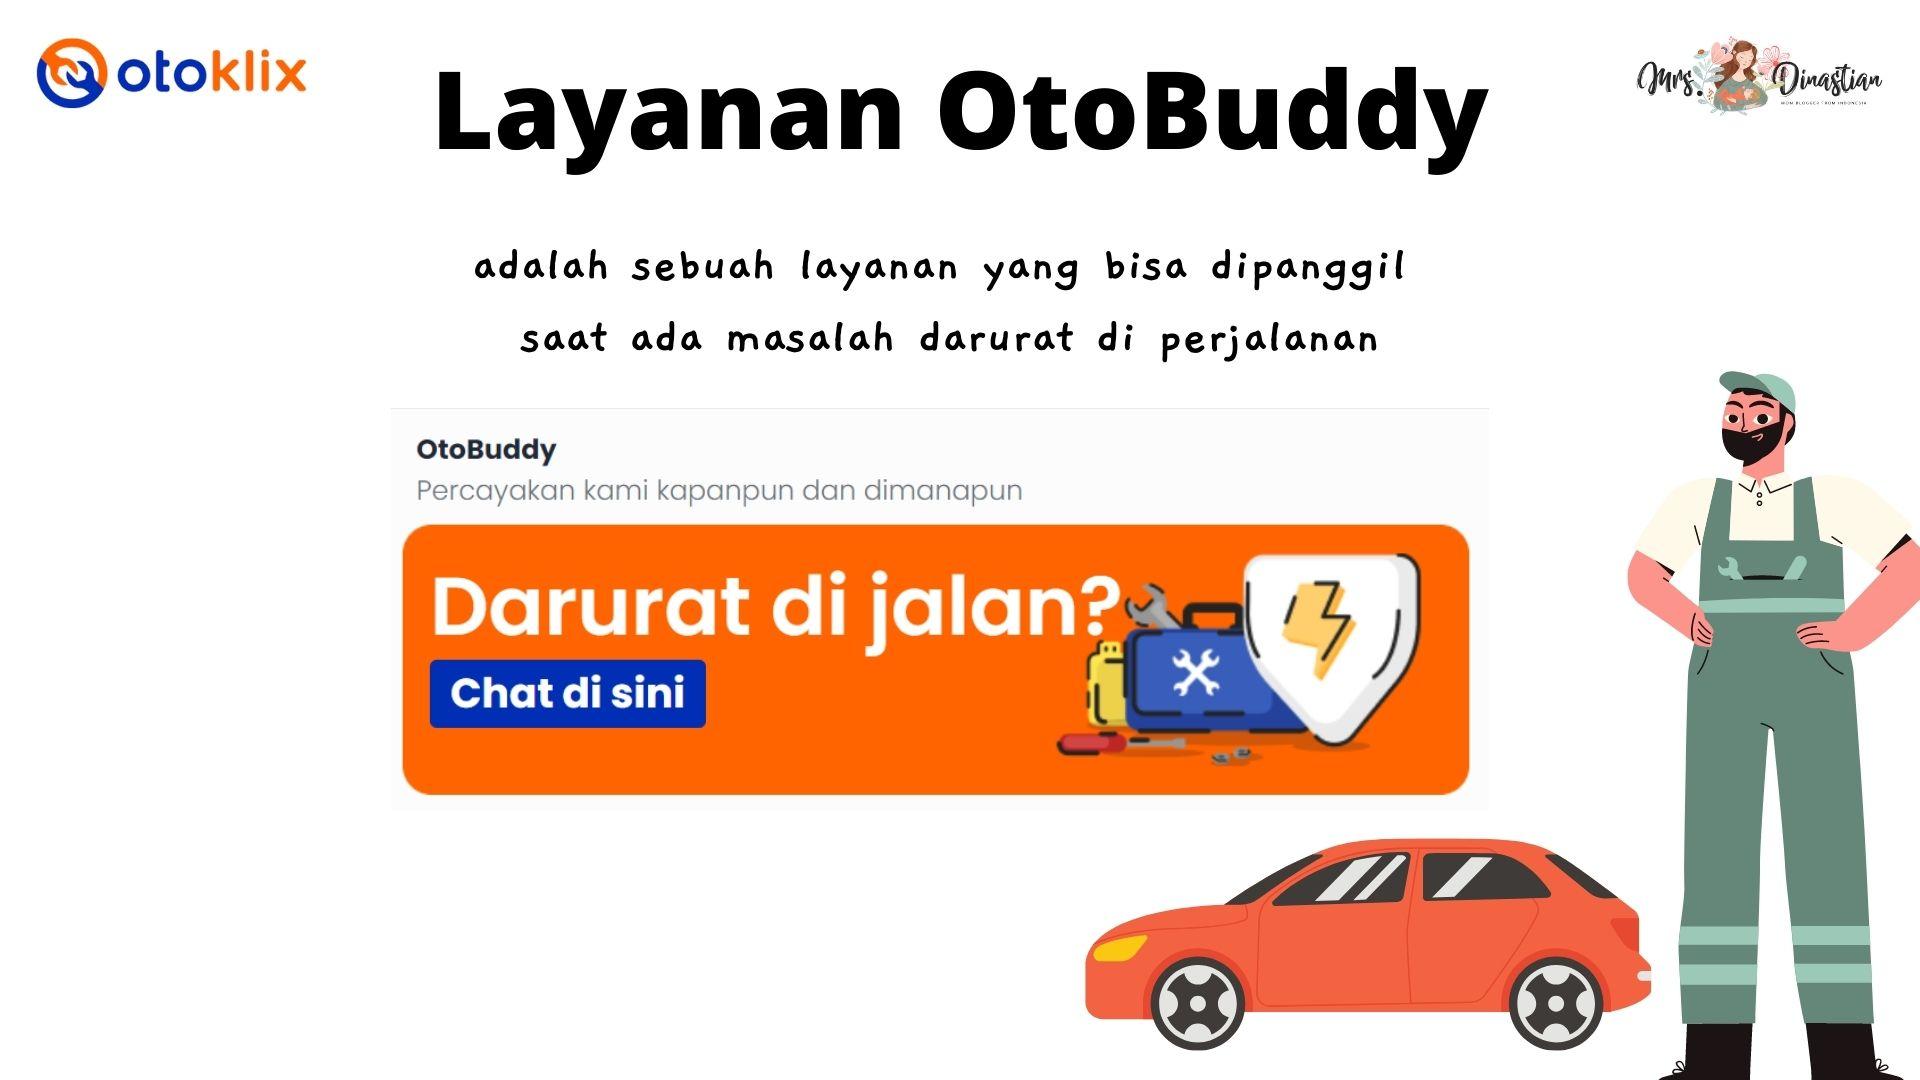 Layanan OtoBuddy Otoklix